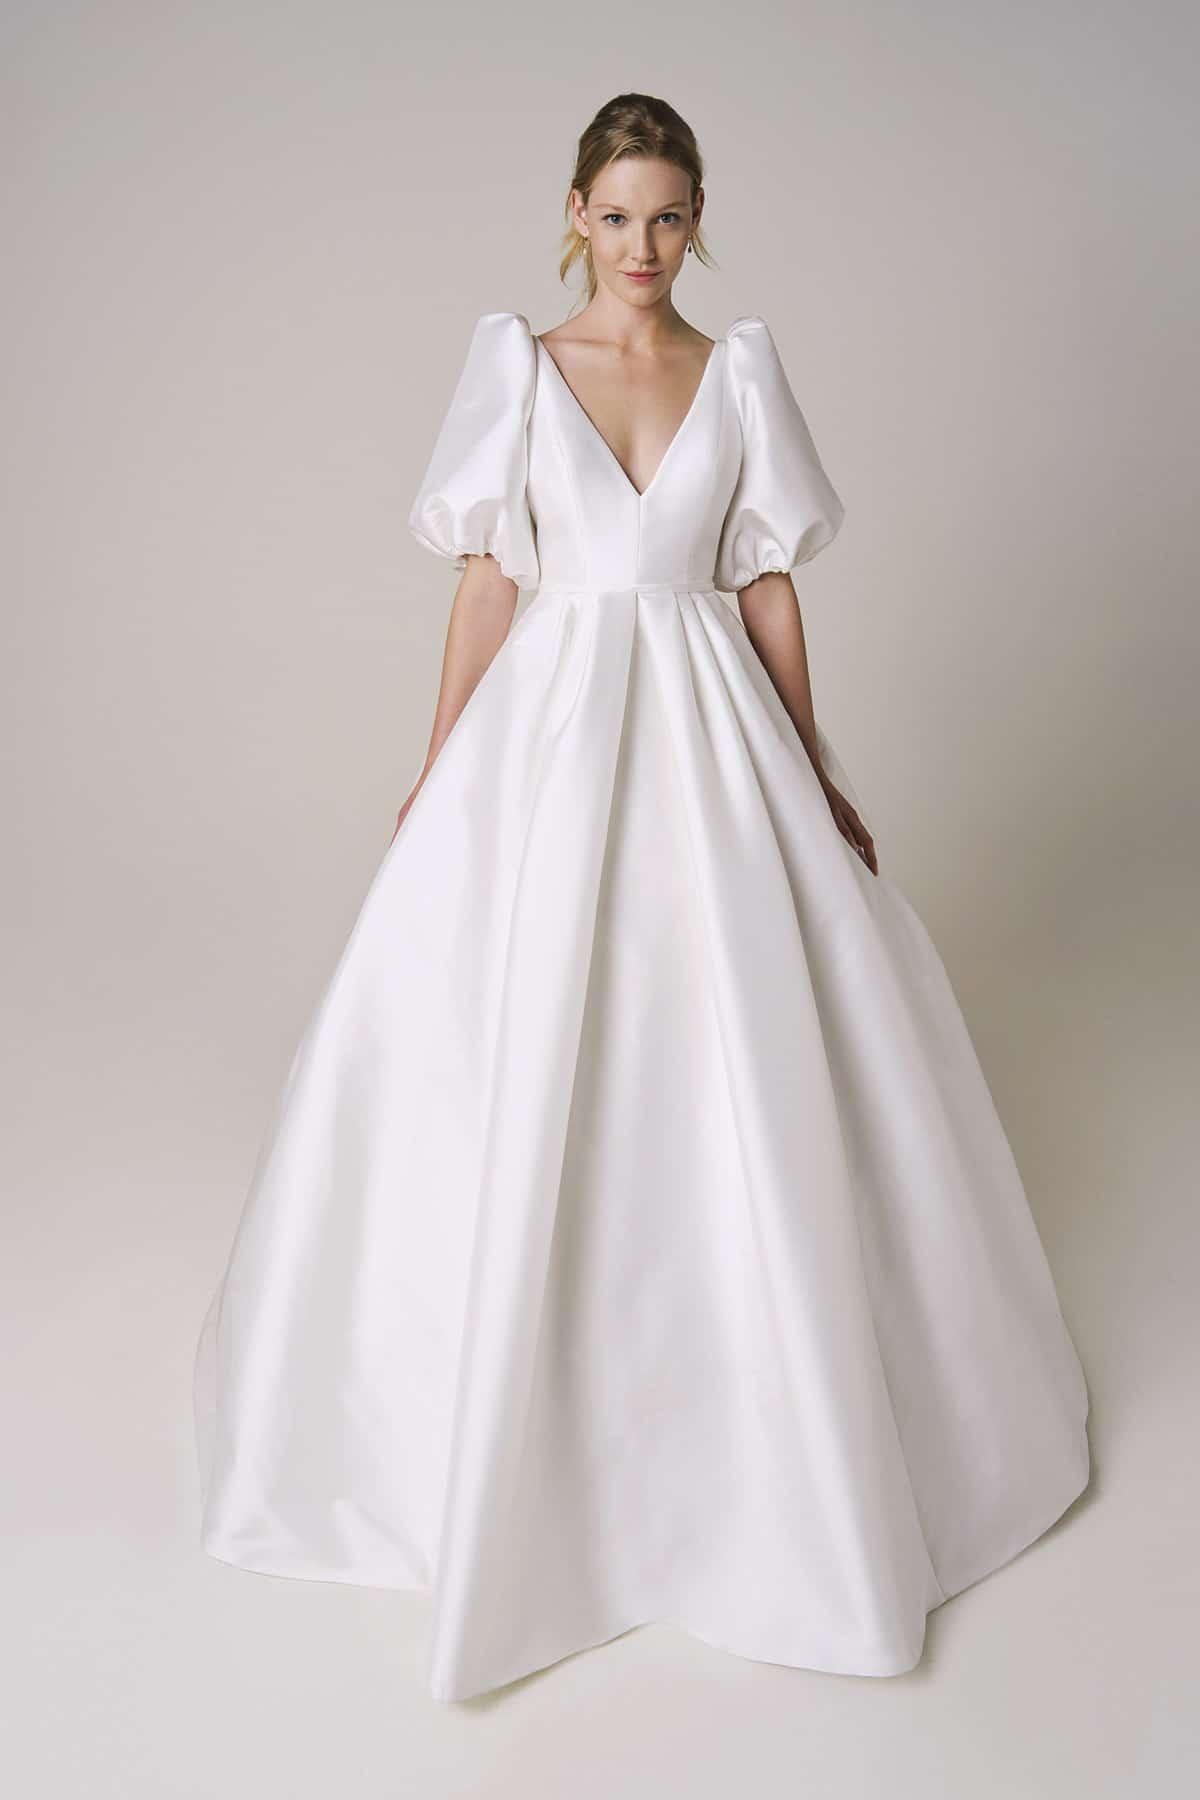 wedding dress with puffy sleeves by Jesus Peiro